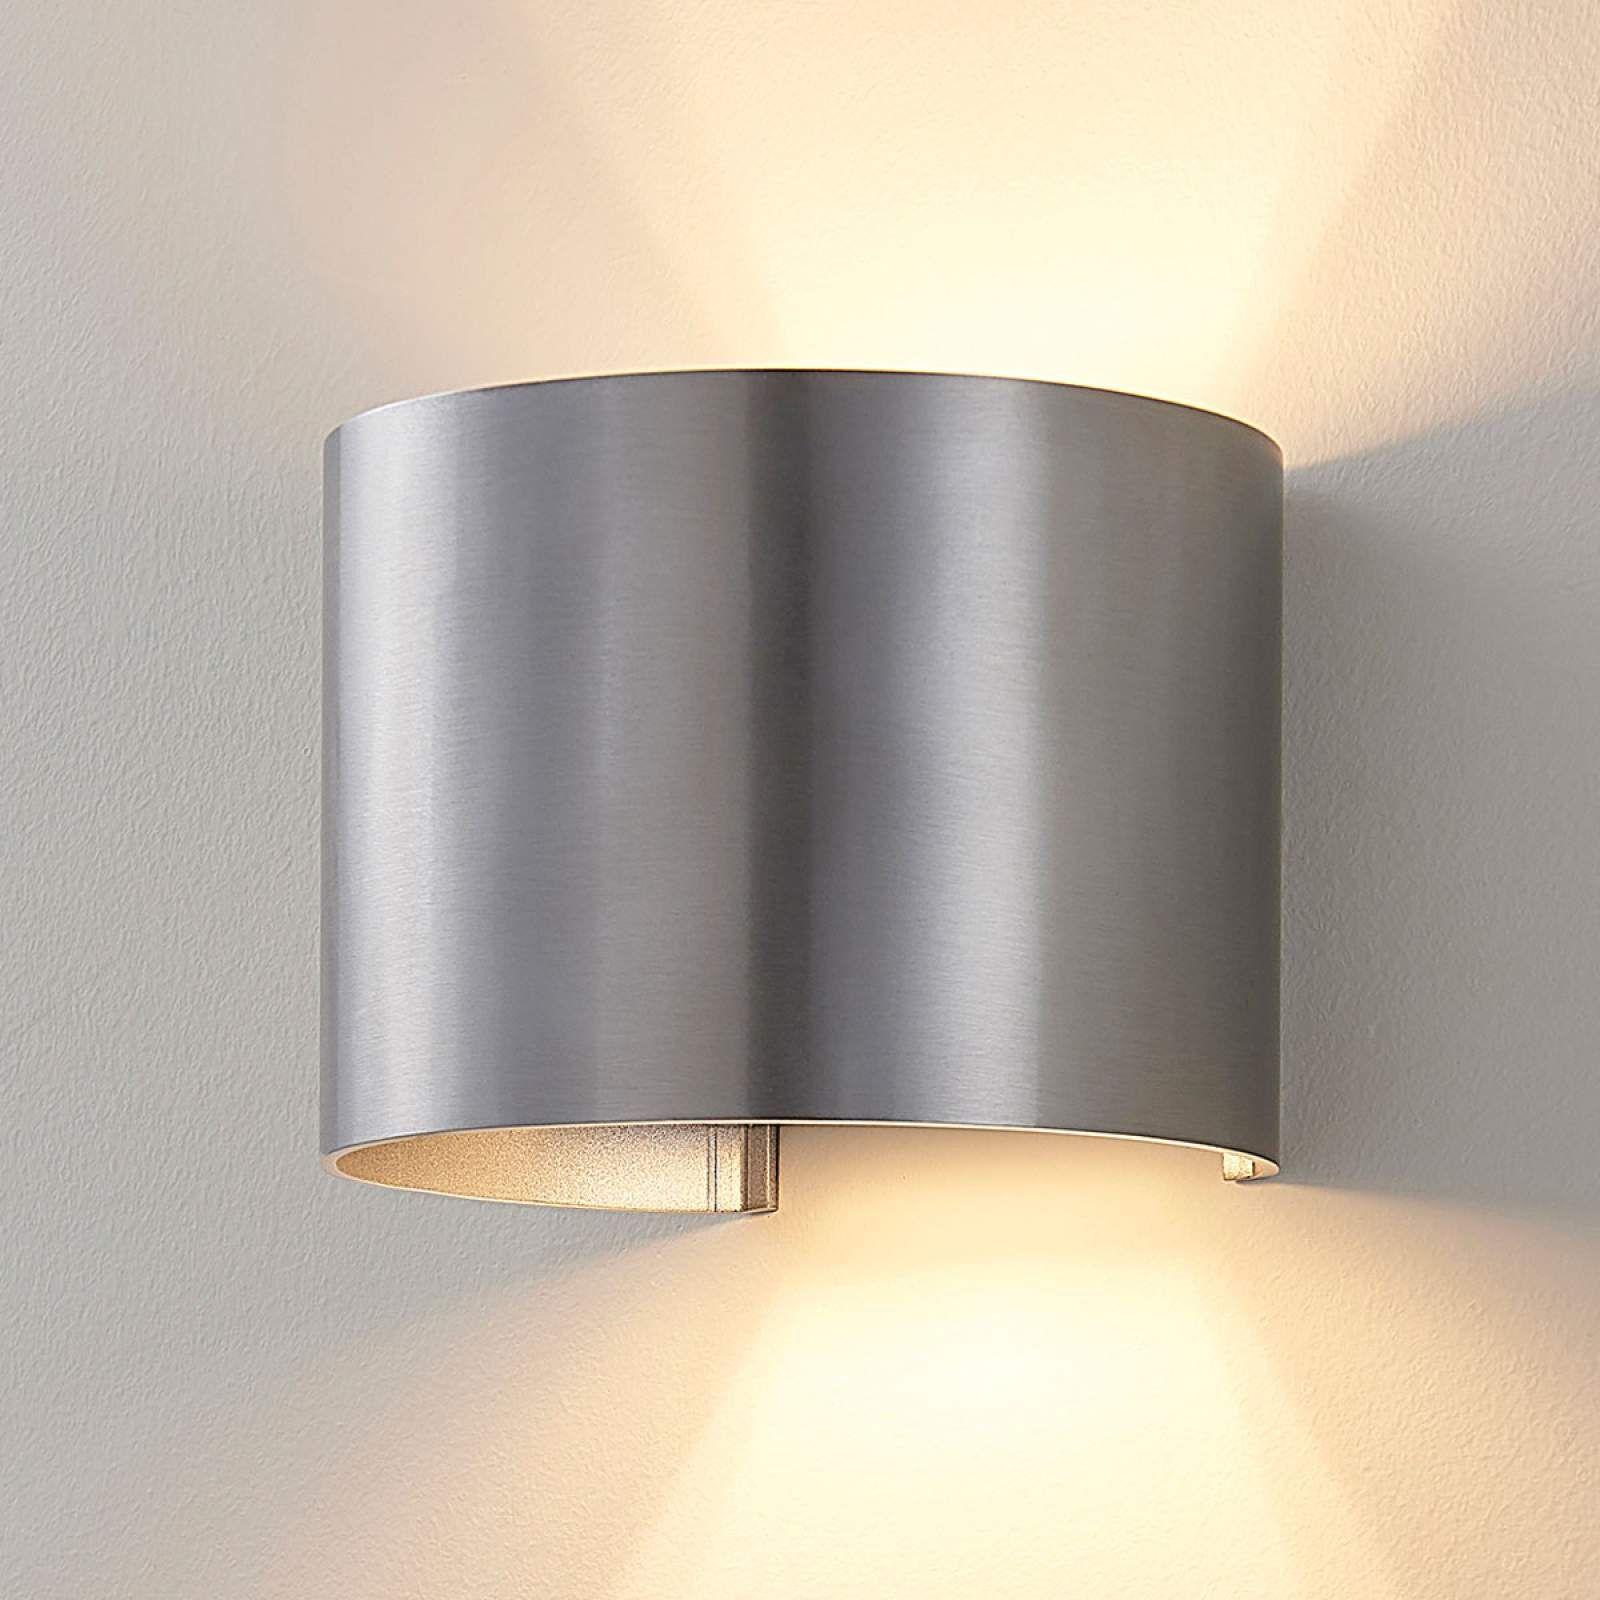 Moderne Wandleuchte Von Arcchio Grau In 2019 Led Lampe Led Wandlampen Und Led Leuchtmittel